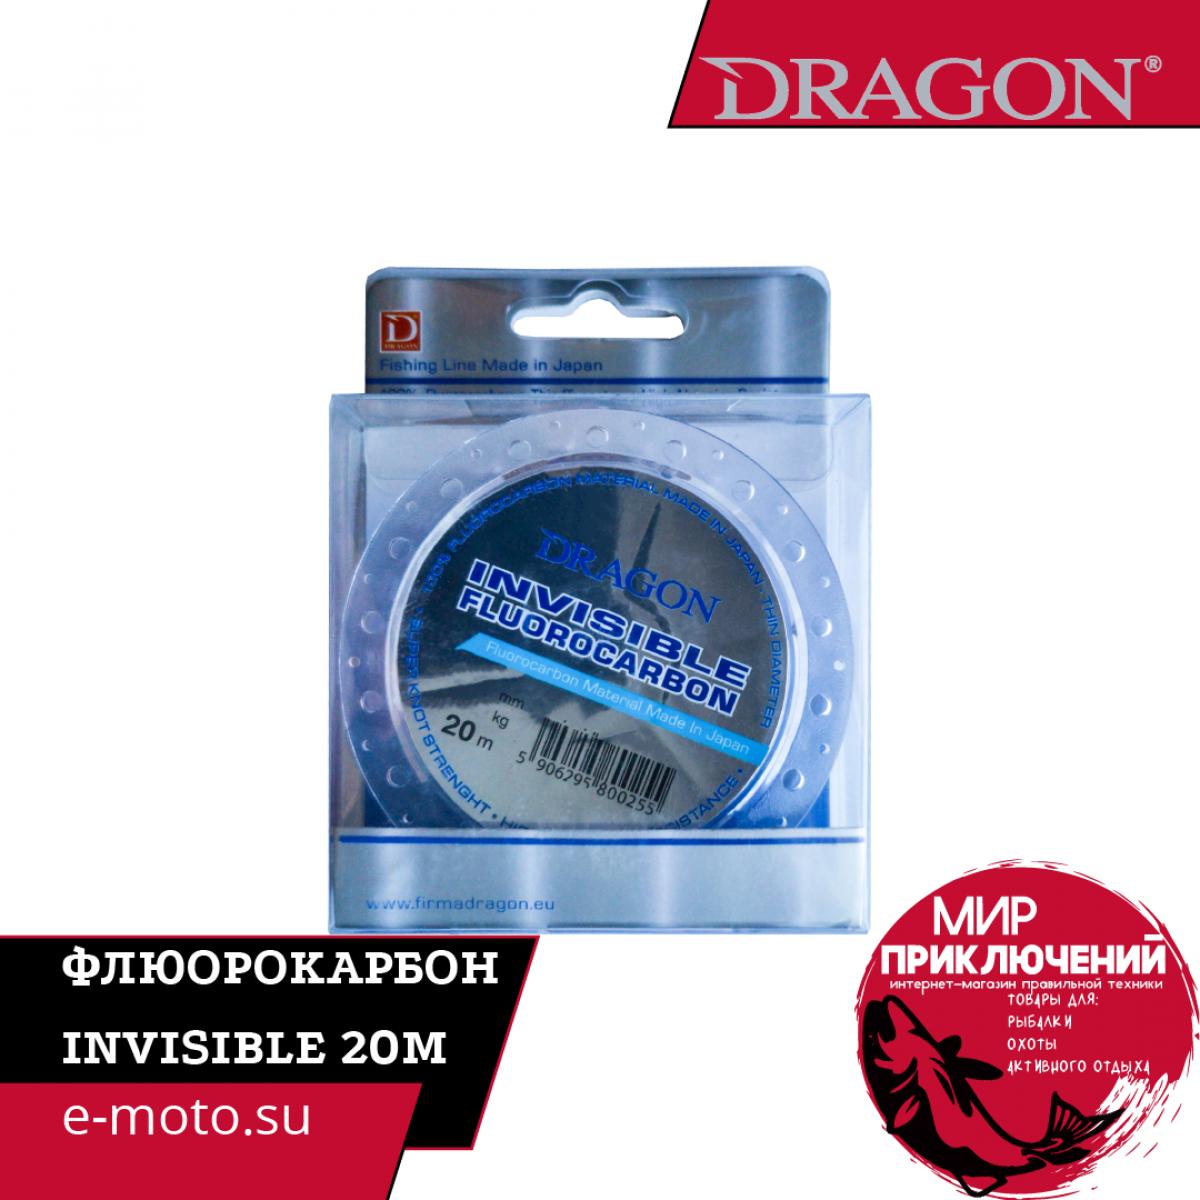 Флюорокарбон Dragon Invisible 20 m 0.700 mm 22.90 kg